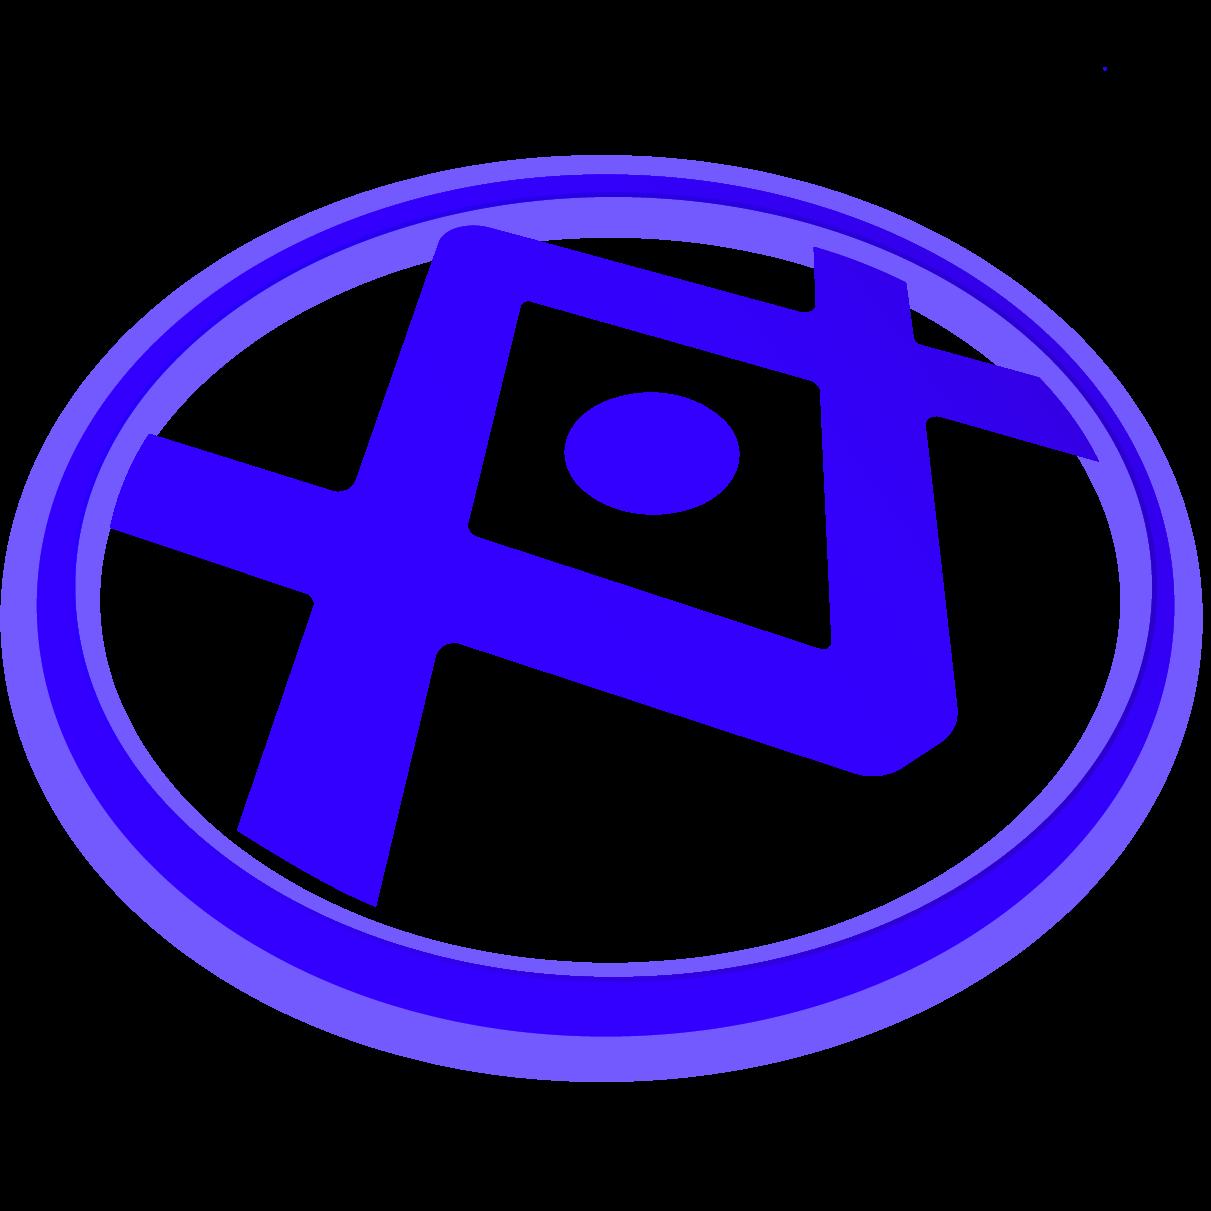 Oltrexx logo